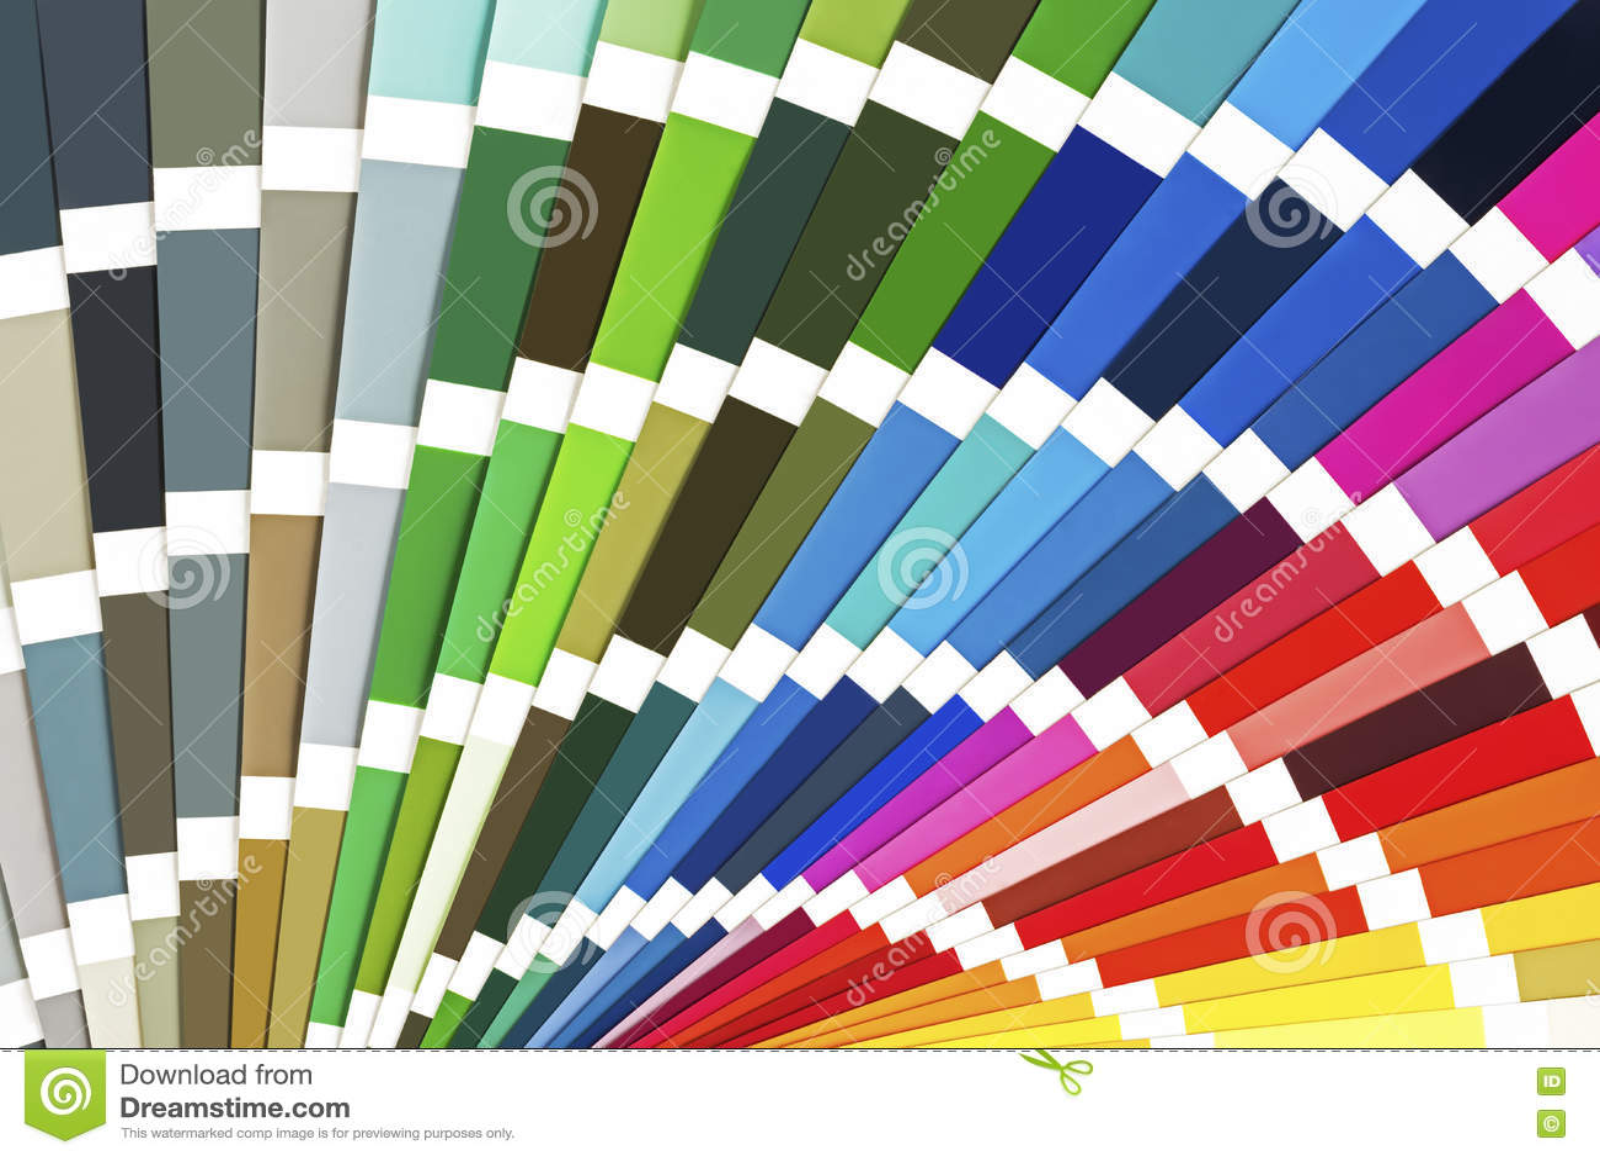 rainbow sample colors catalogue color guide palette background